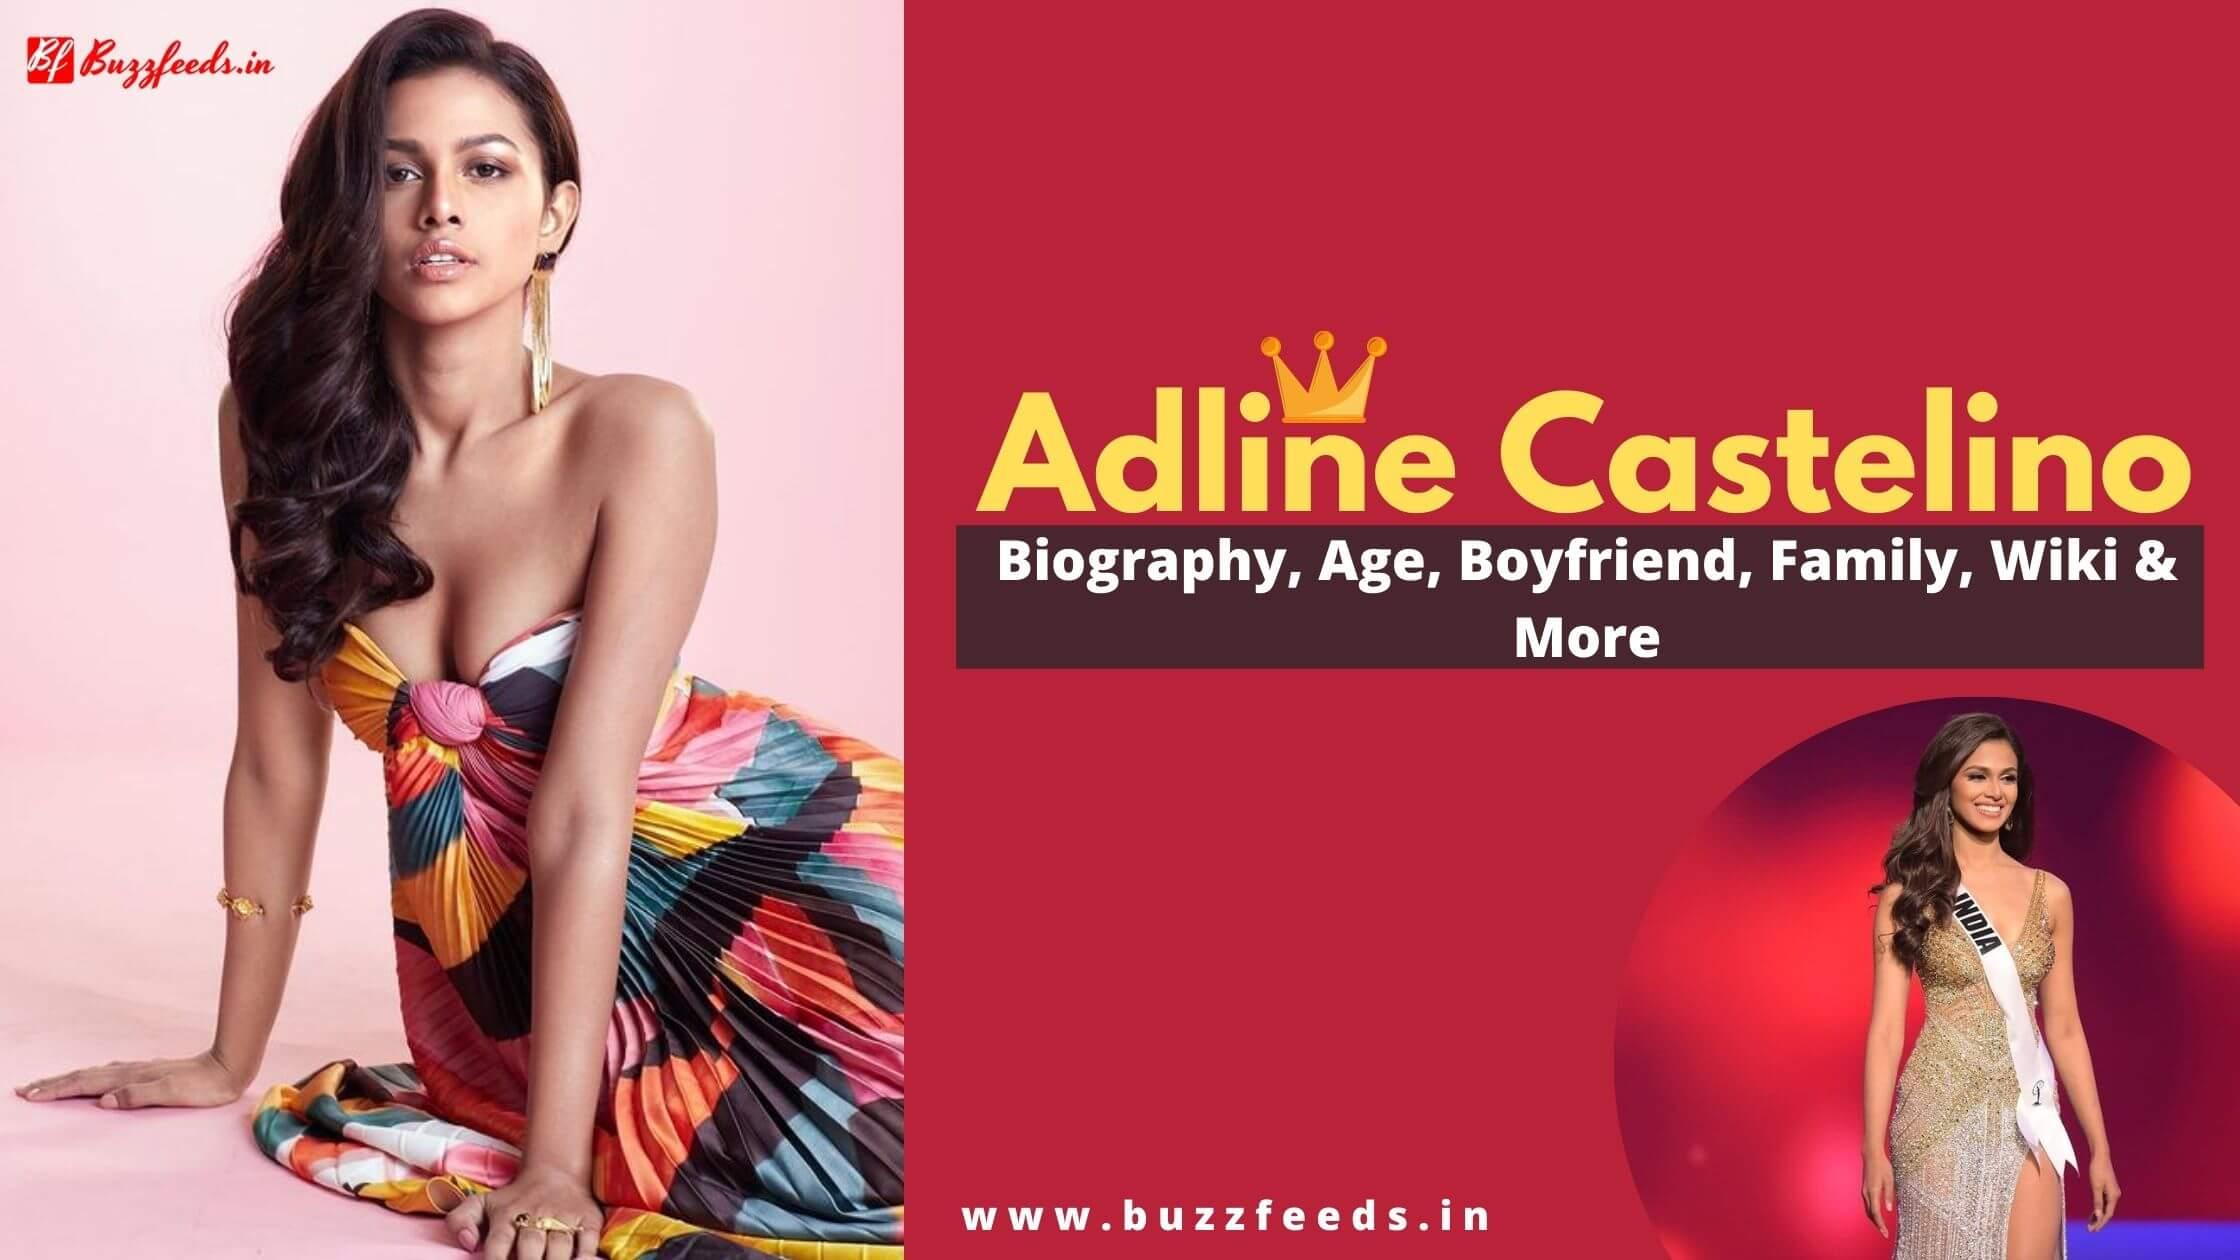 Adline Castelino Biography, Age, Boyfriend, Family, Wiki & More